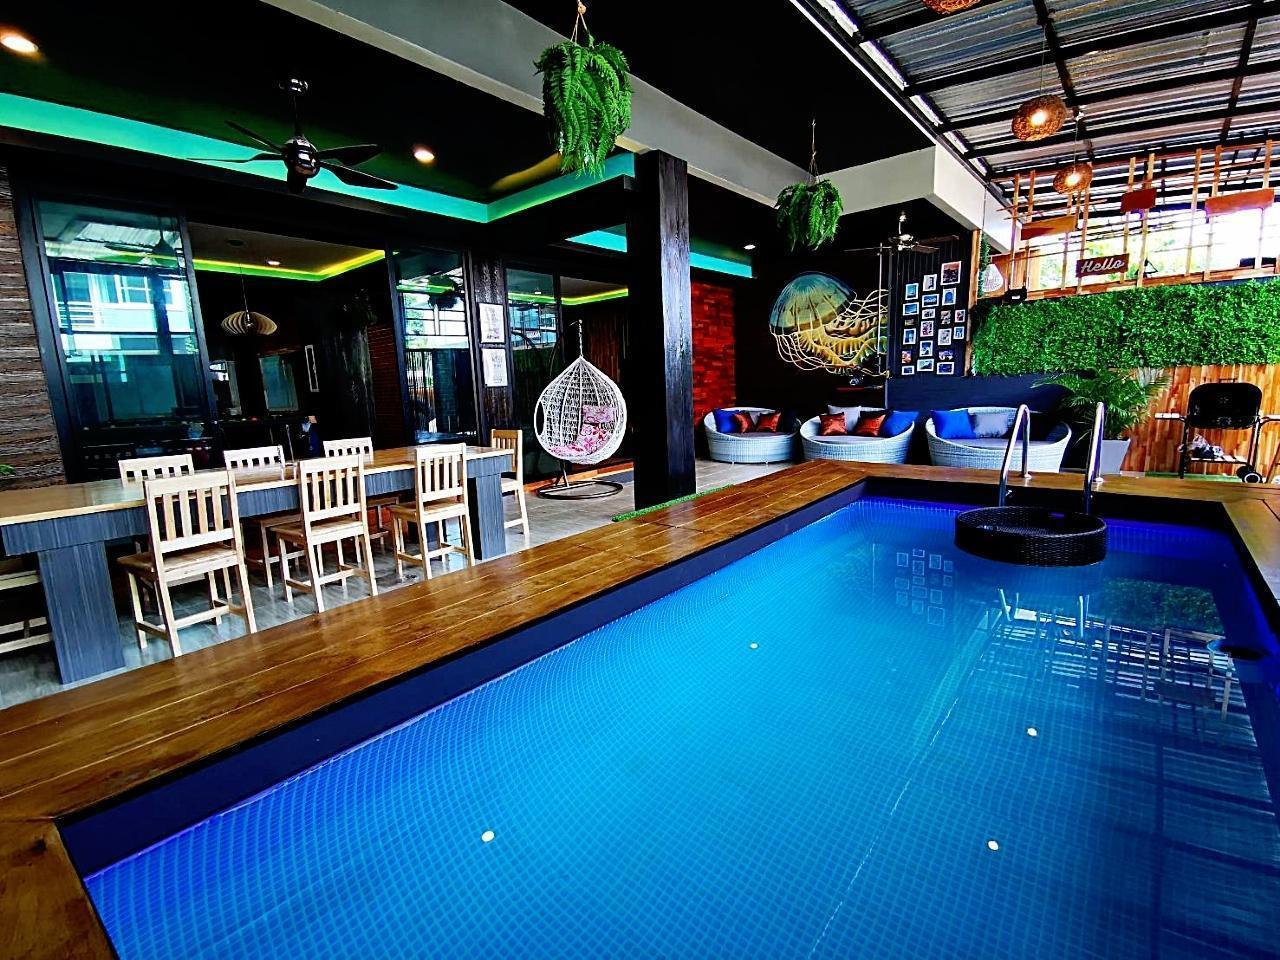 The narada 4 bedrooms private pool villa krabi วิลลา 4 ห้องนอน 5 ห้องน้ำส่วนตัว ขนาด 300 ตร.ม. – กระบี่ น้อย